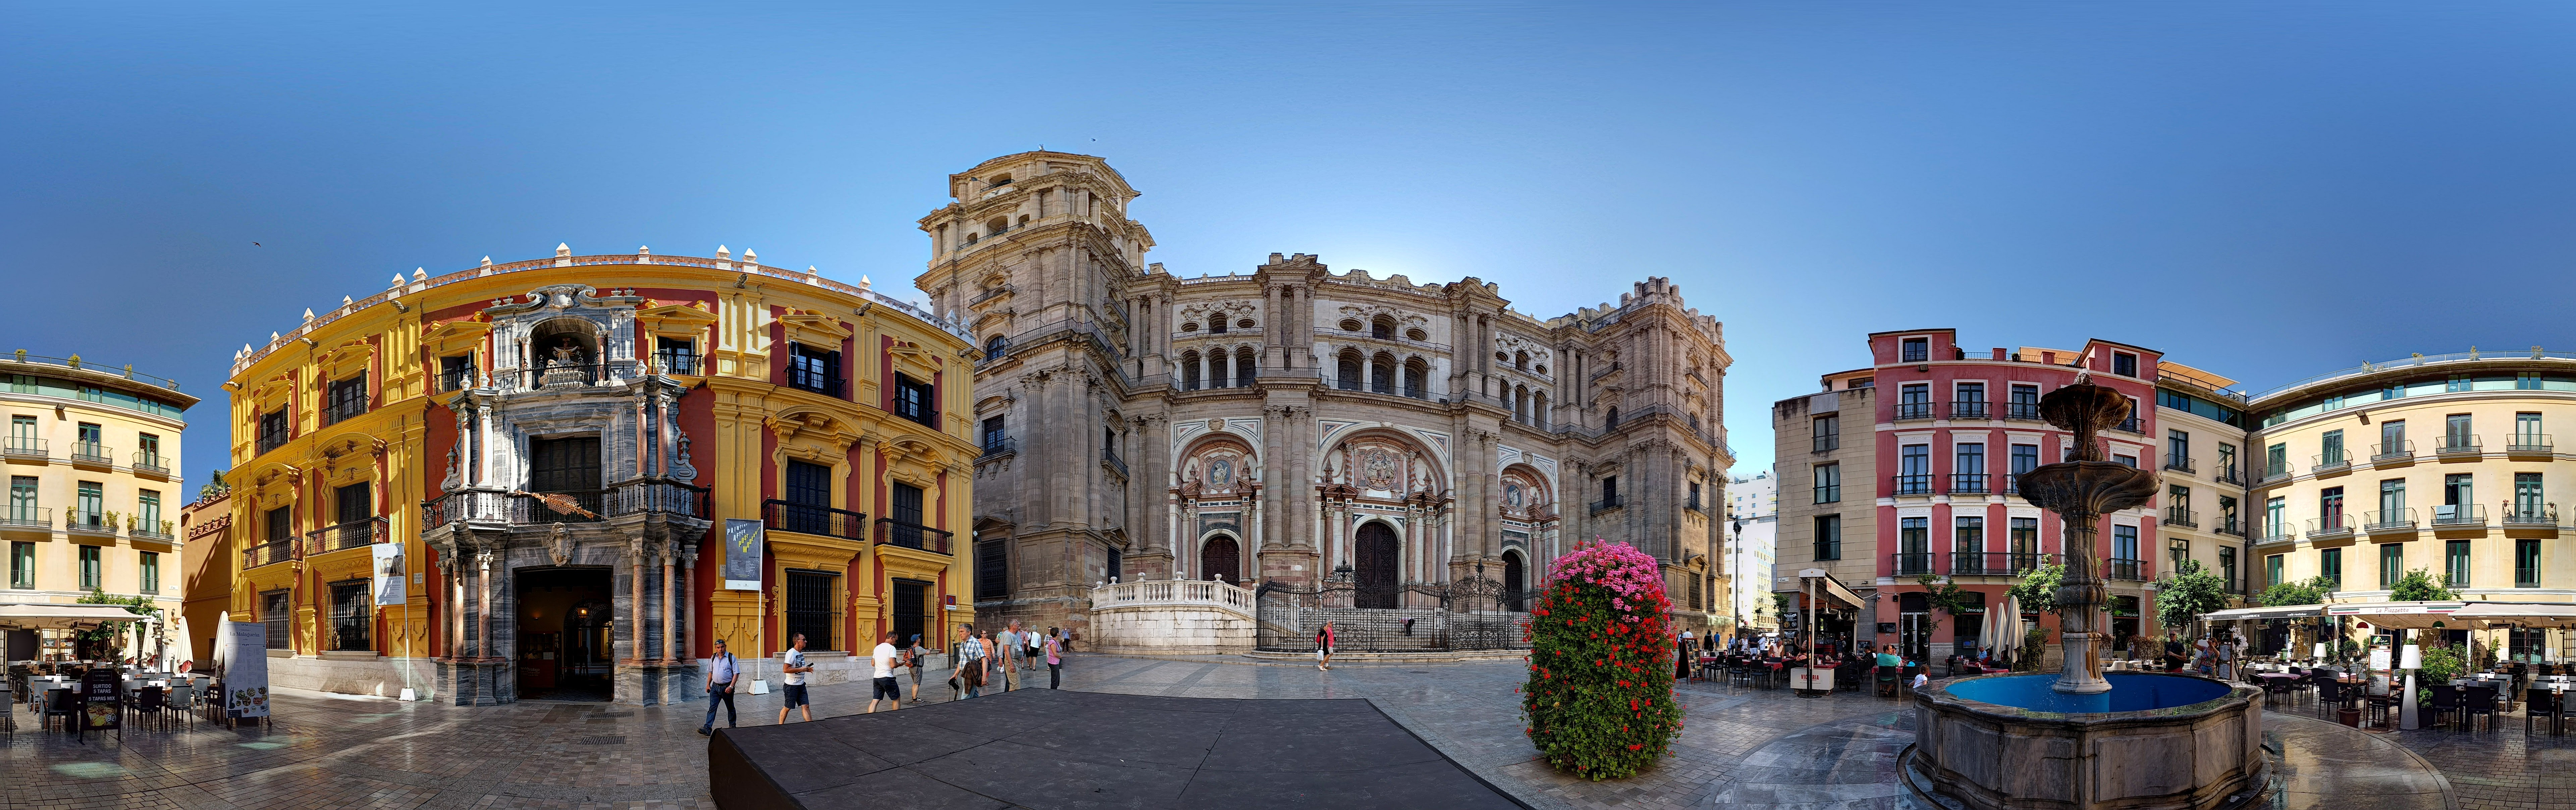 360 Photo — Plaza del Obispo